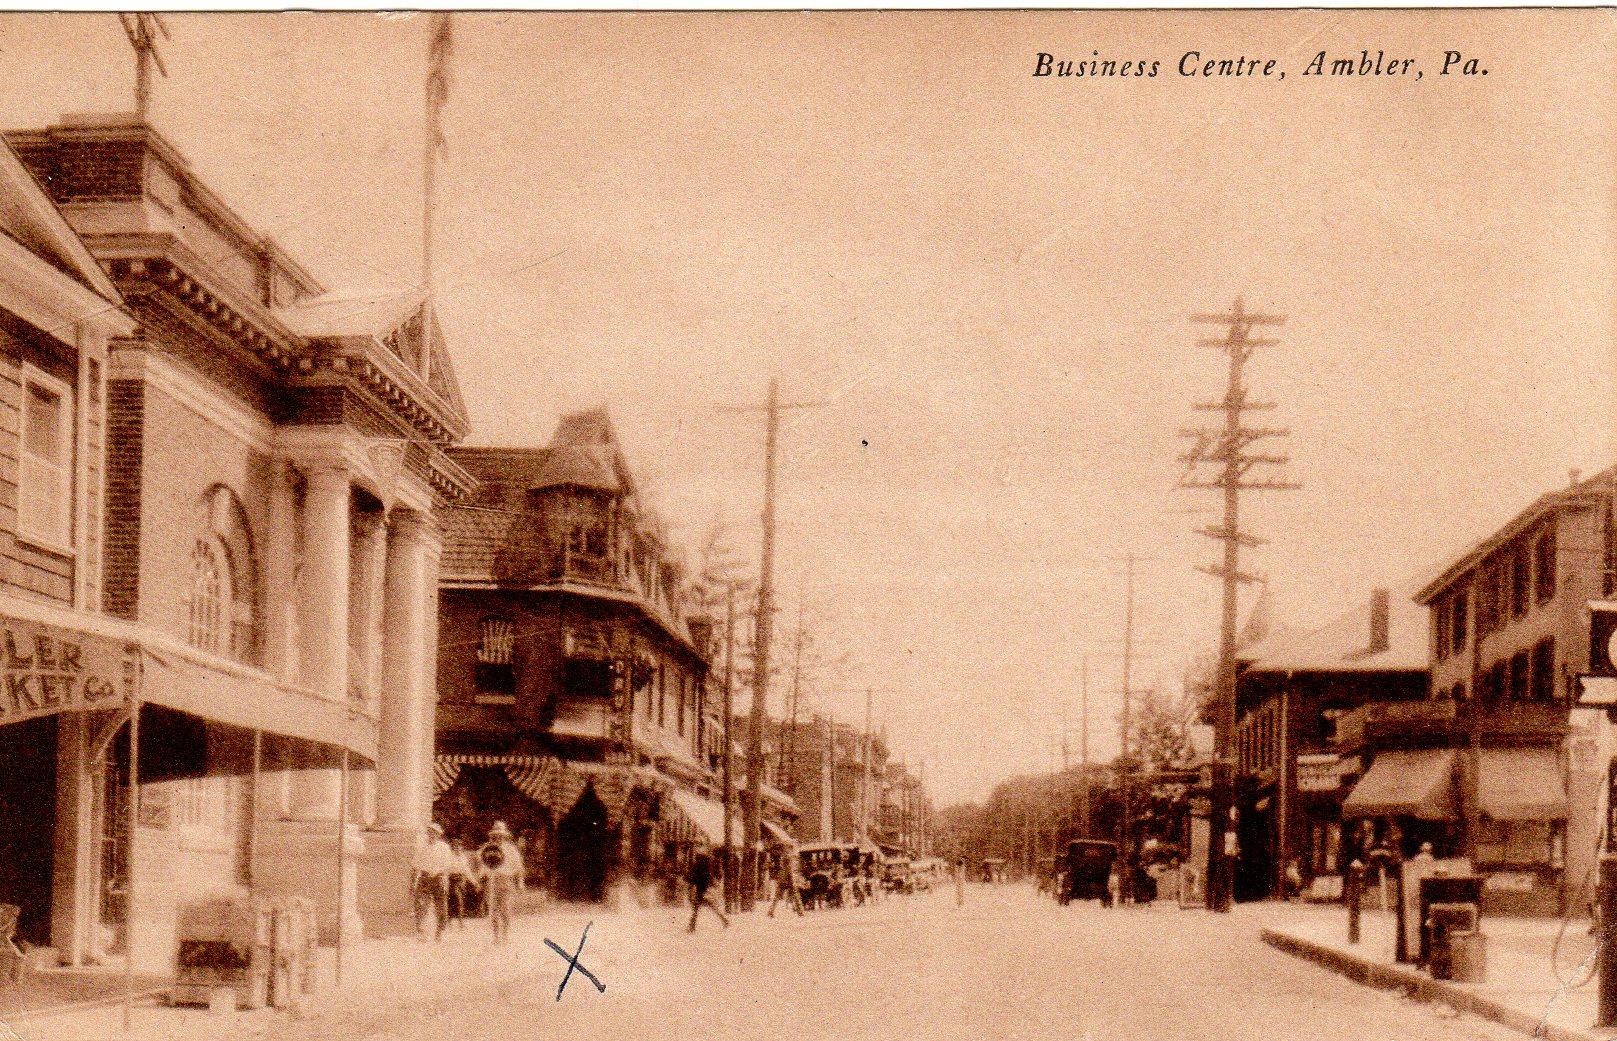 Post Card Collection (E Simon)_2682_50_Business Centre, Ambler, Pa_6 Jul 1933